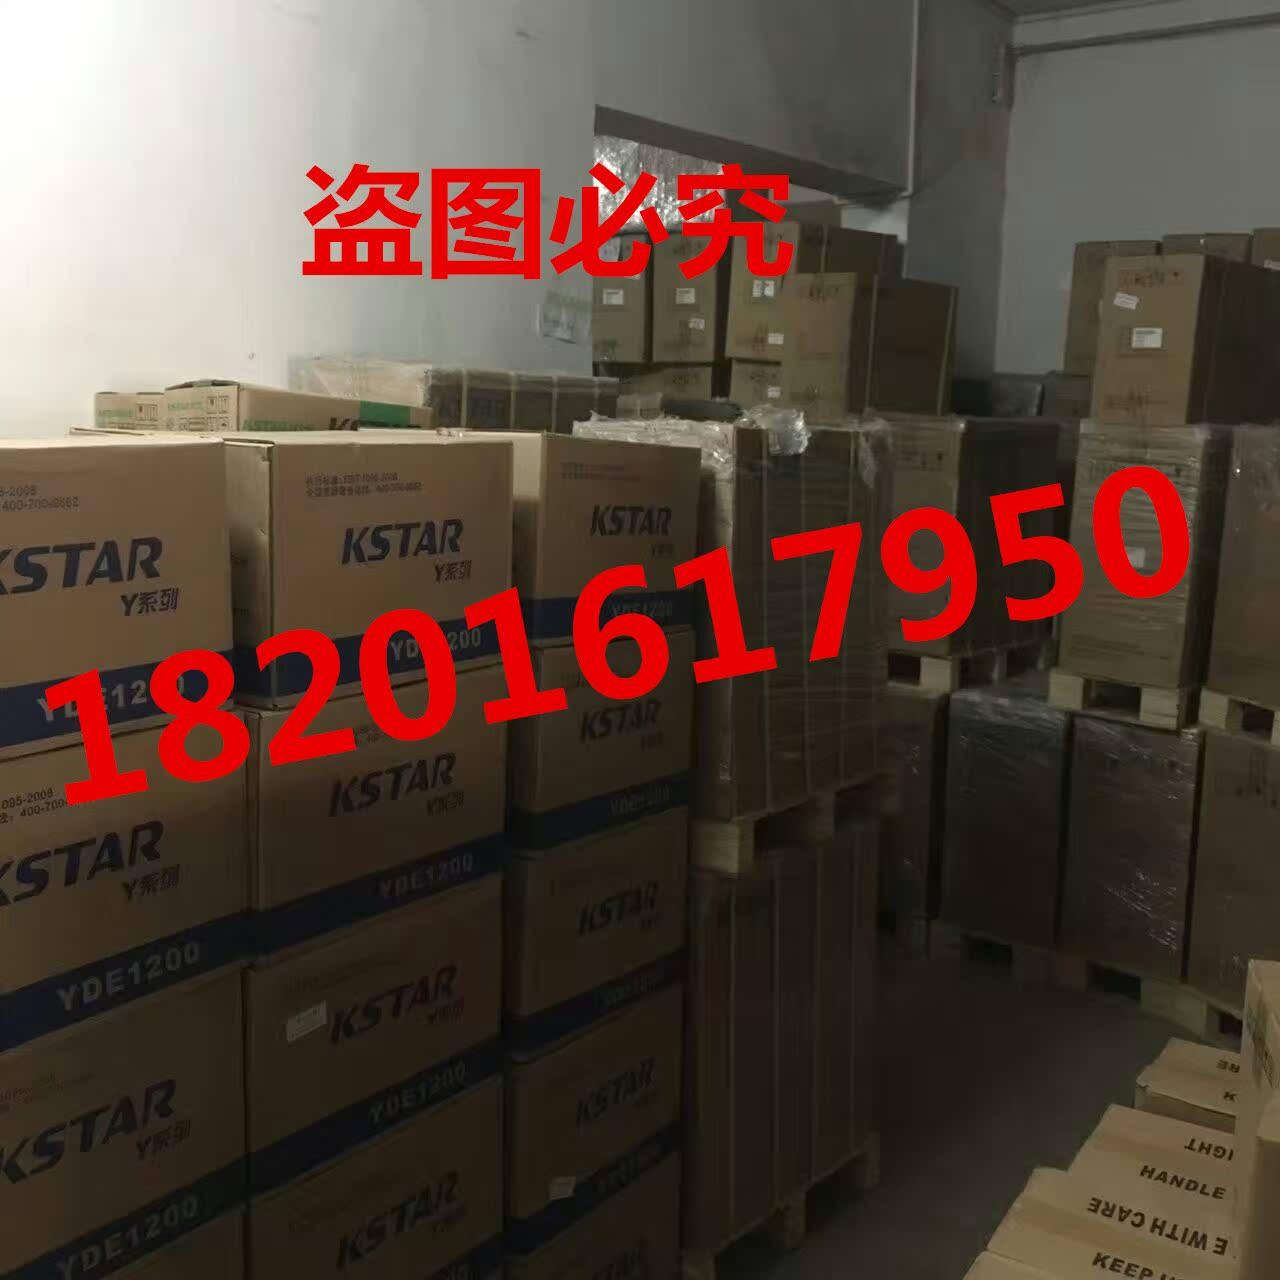 KSTAR KSTAR UPS uninterrupted power supply, YDE2060 stabilized voltage, 360W backup 600VA mail